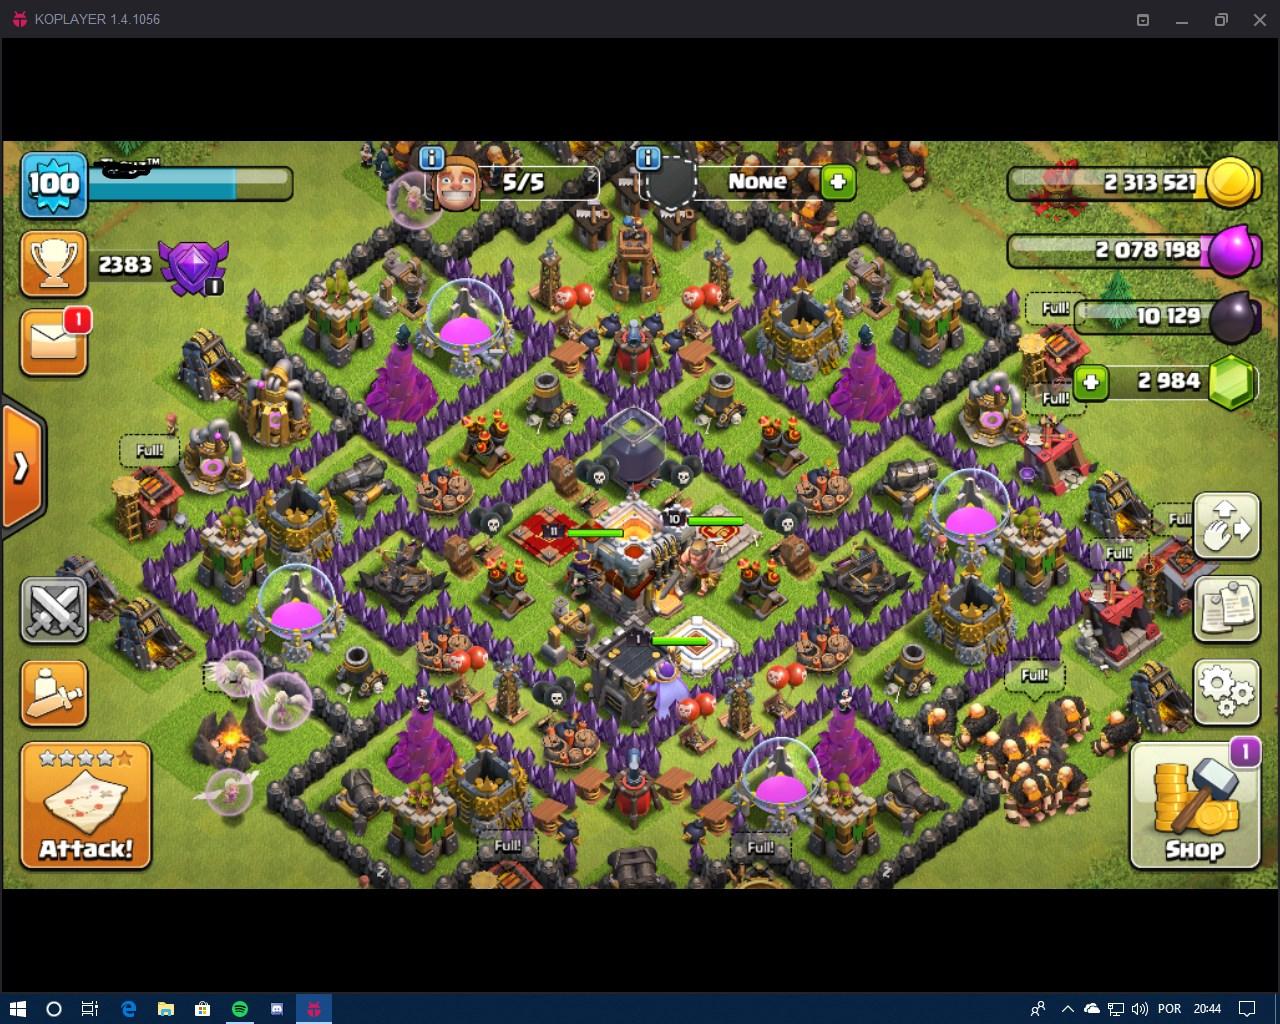 Clash Of Clans Cv9 Quase Full E Vila Do Contrutor Nivel 7 Dfg